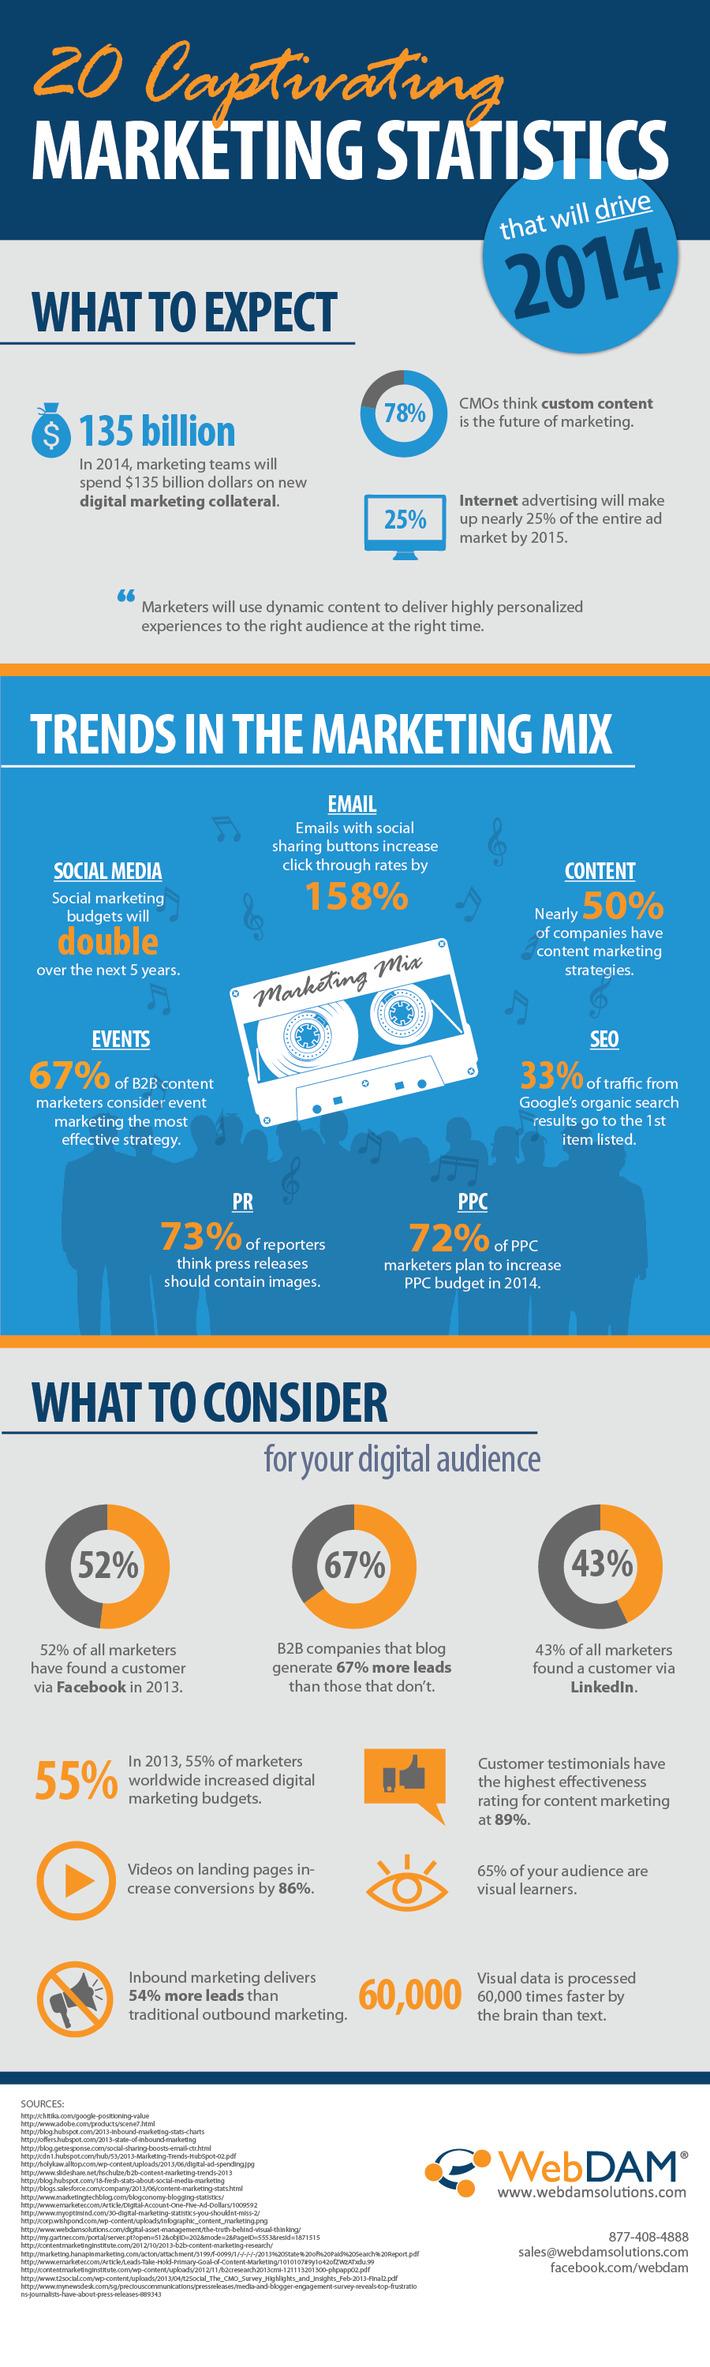 2014 Marketing Statistics Infographic | A Marketing Mix | Scoop.it